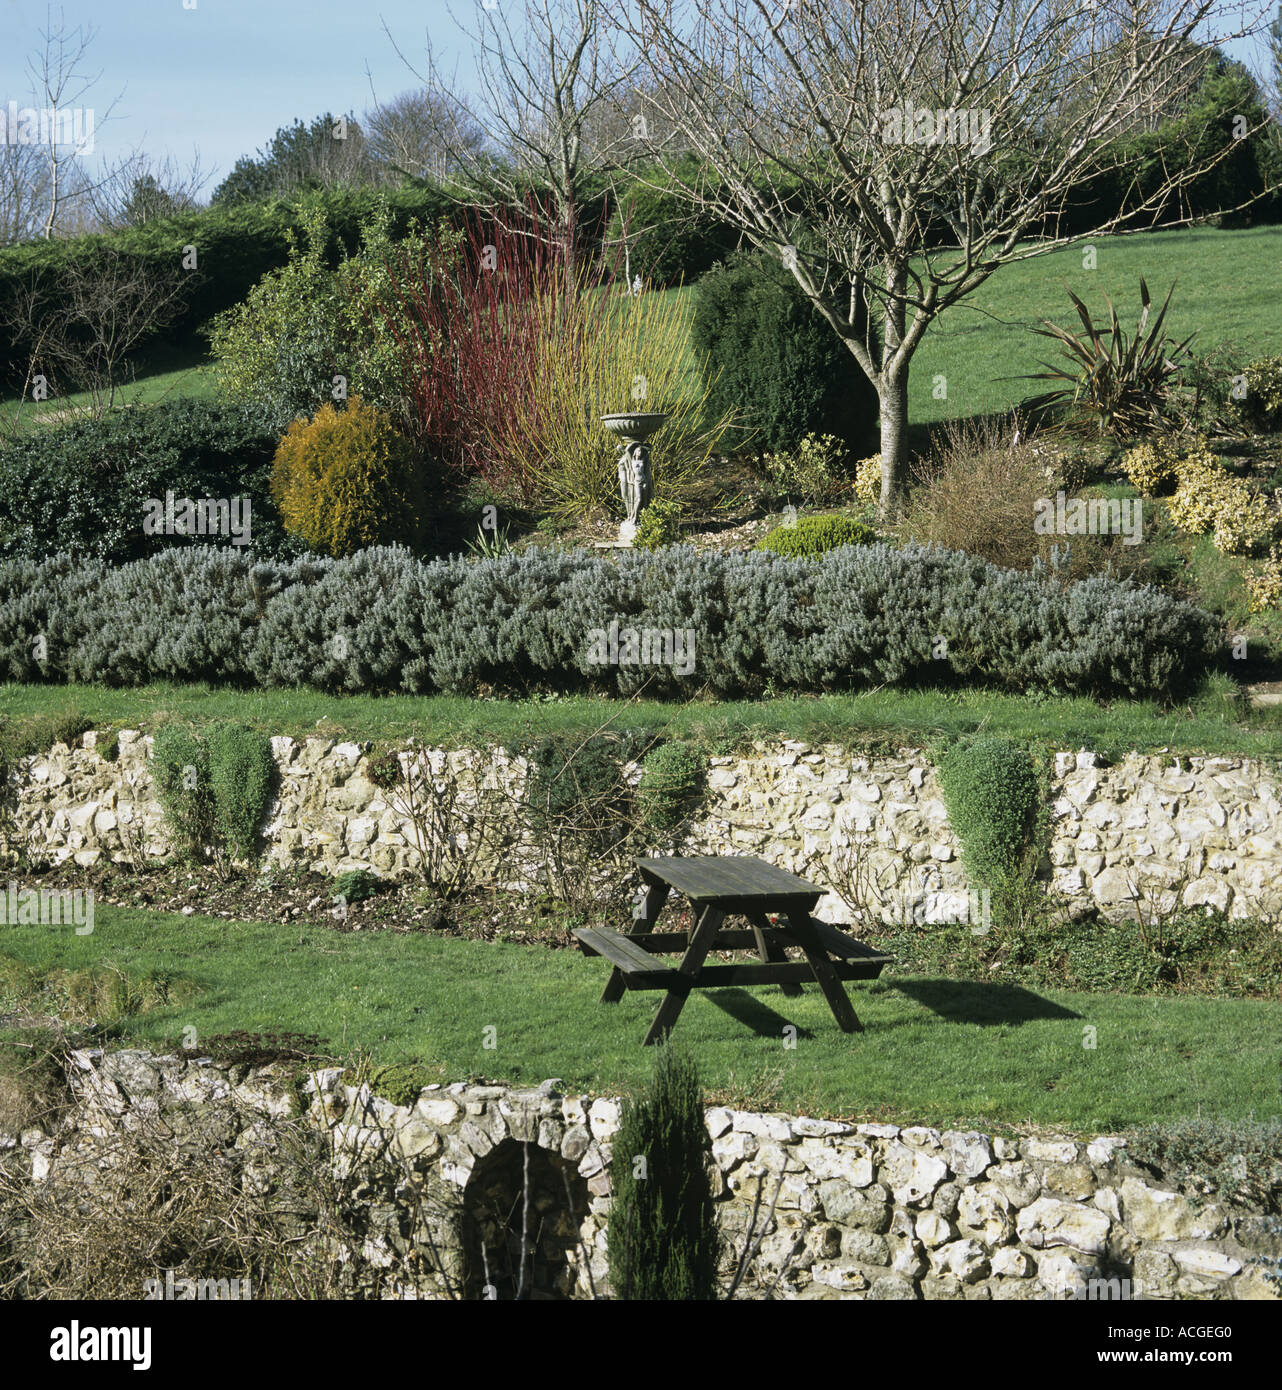 Jardin En Terrasses En Pente Avec Des Murs De Soutenement En Pierre